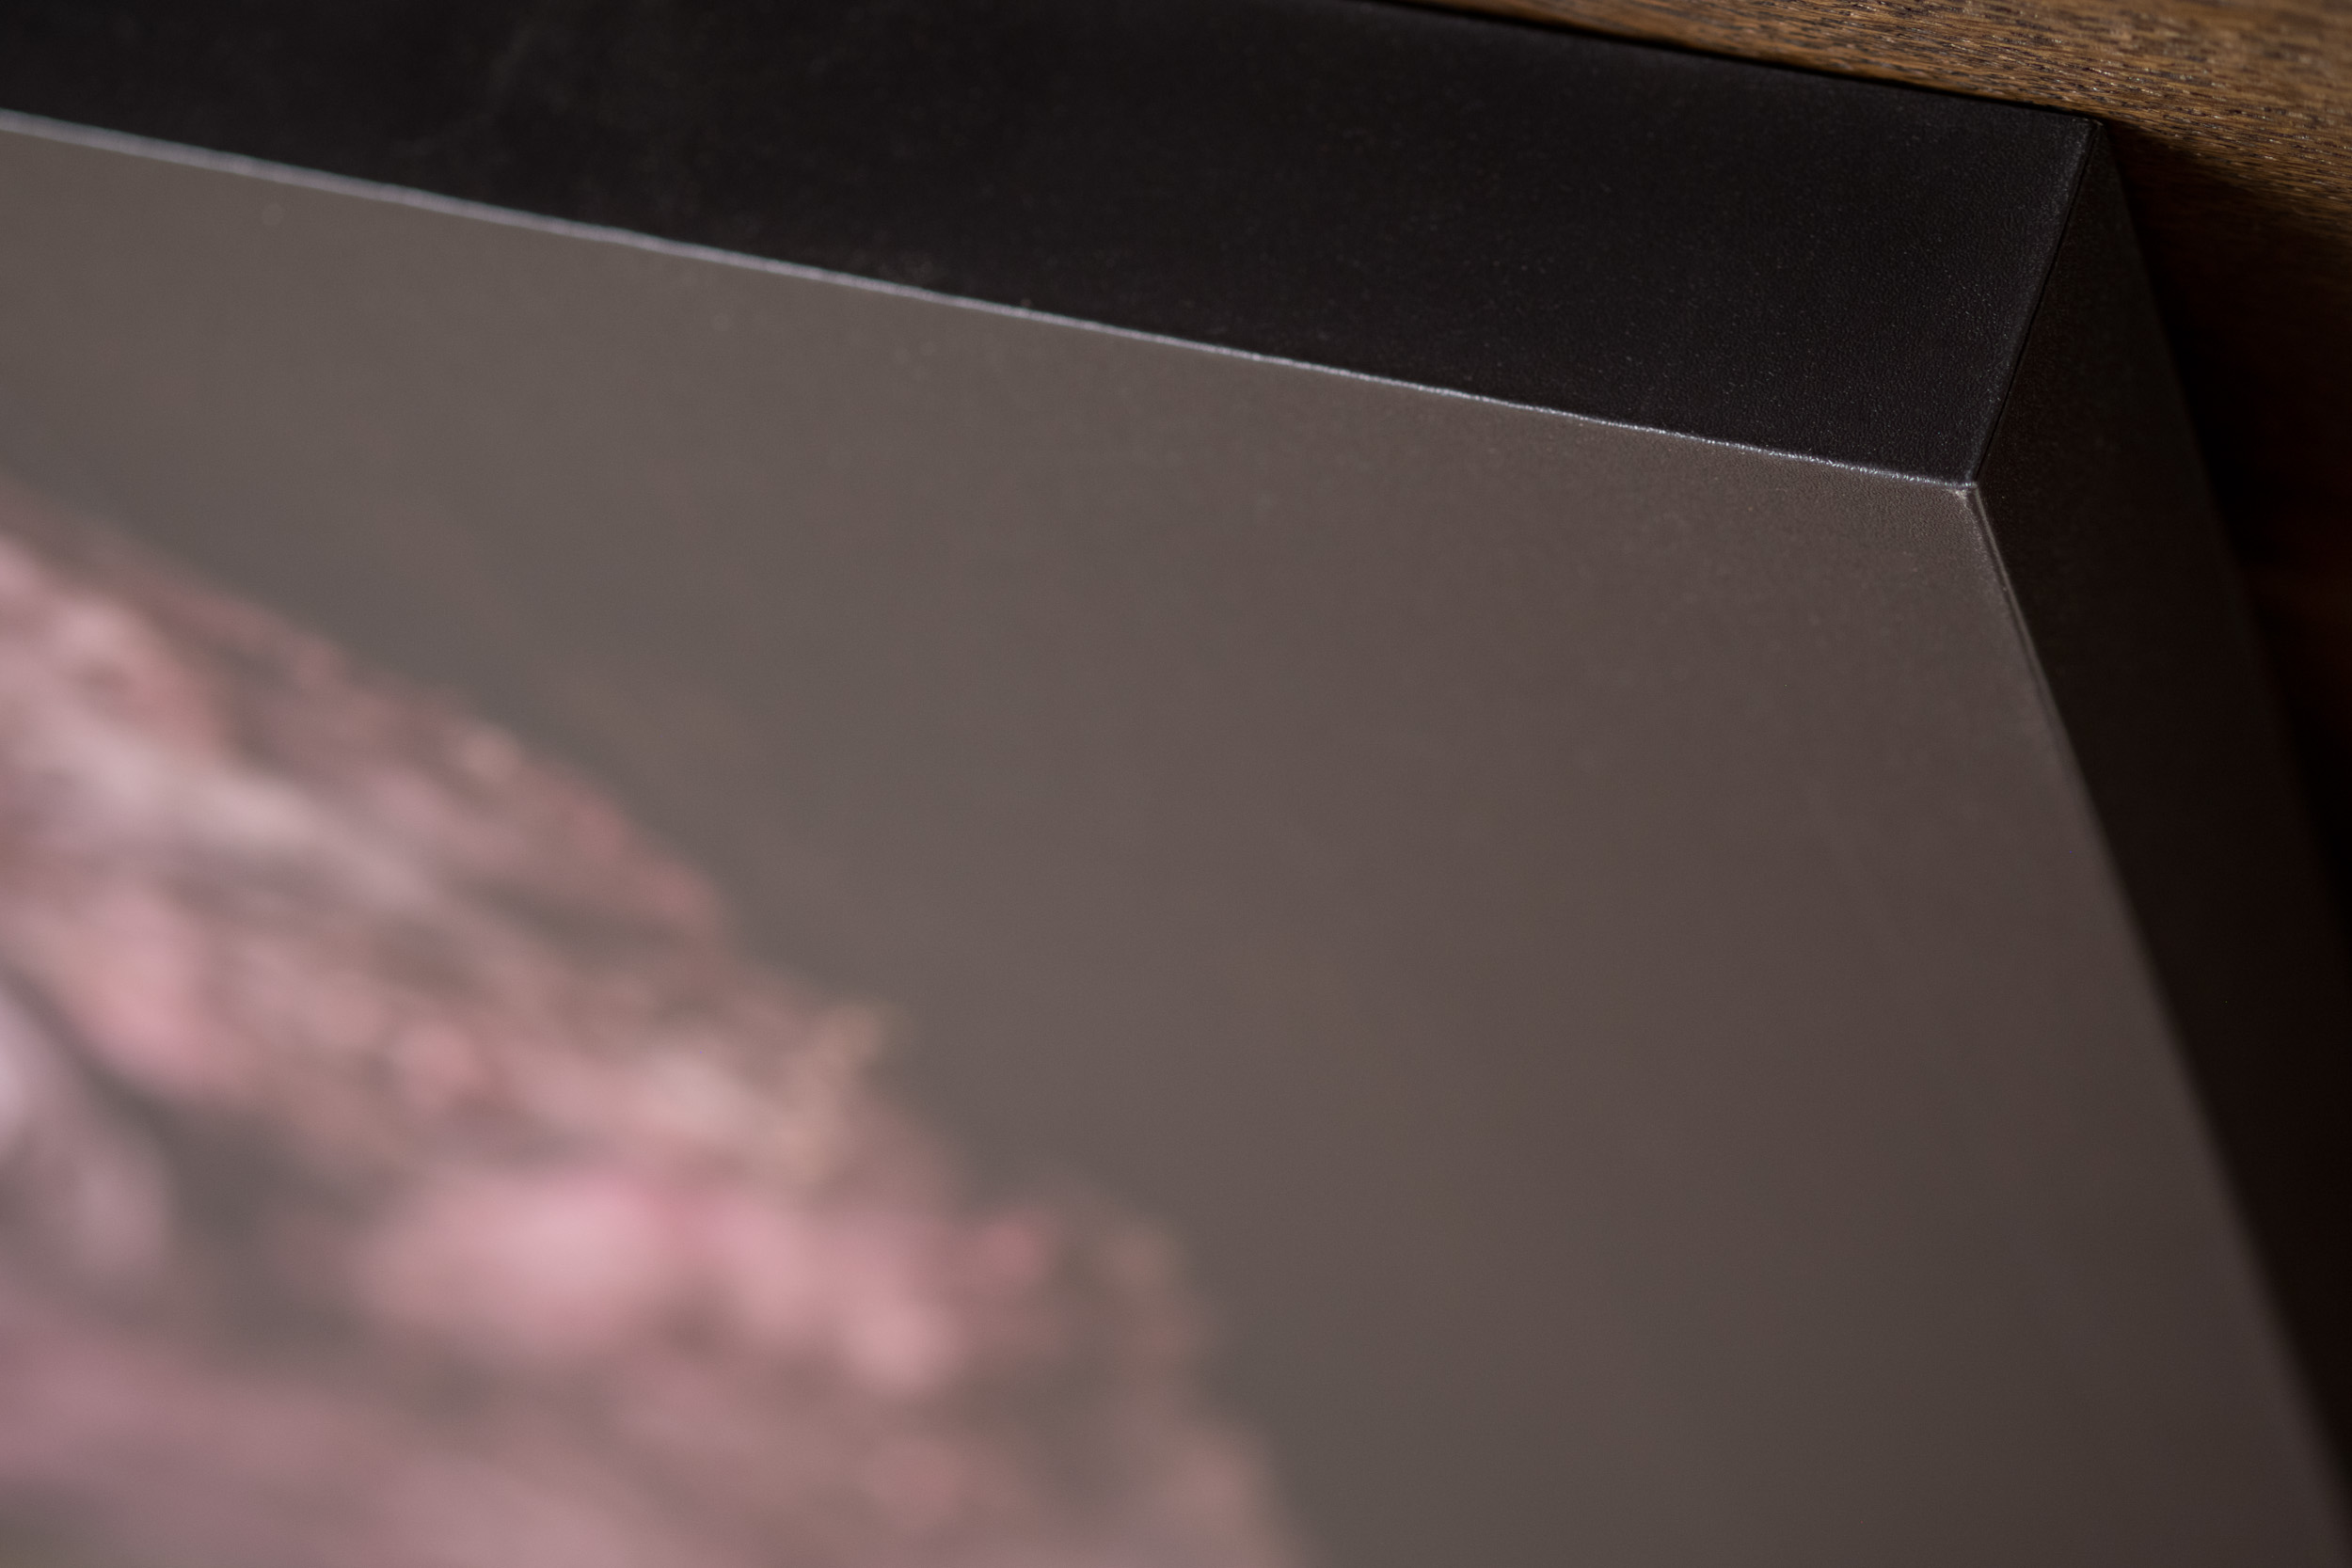 Newborn-Photography-Lincoln-Luxury-Canvas-002.jpg